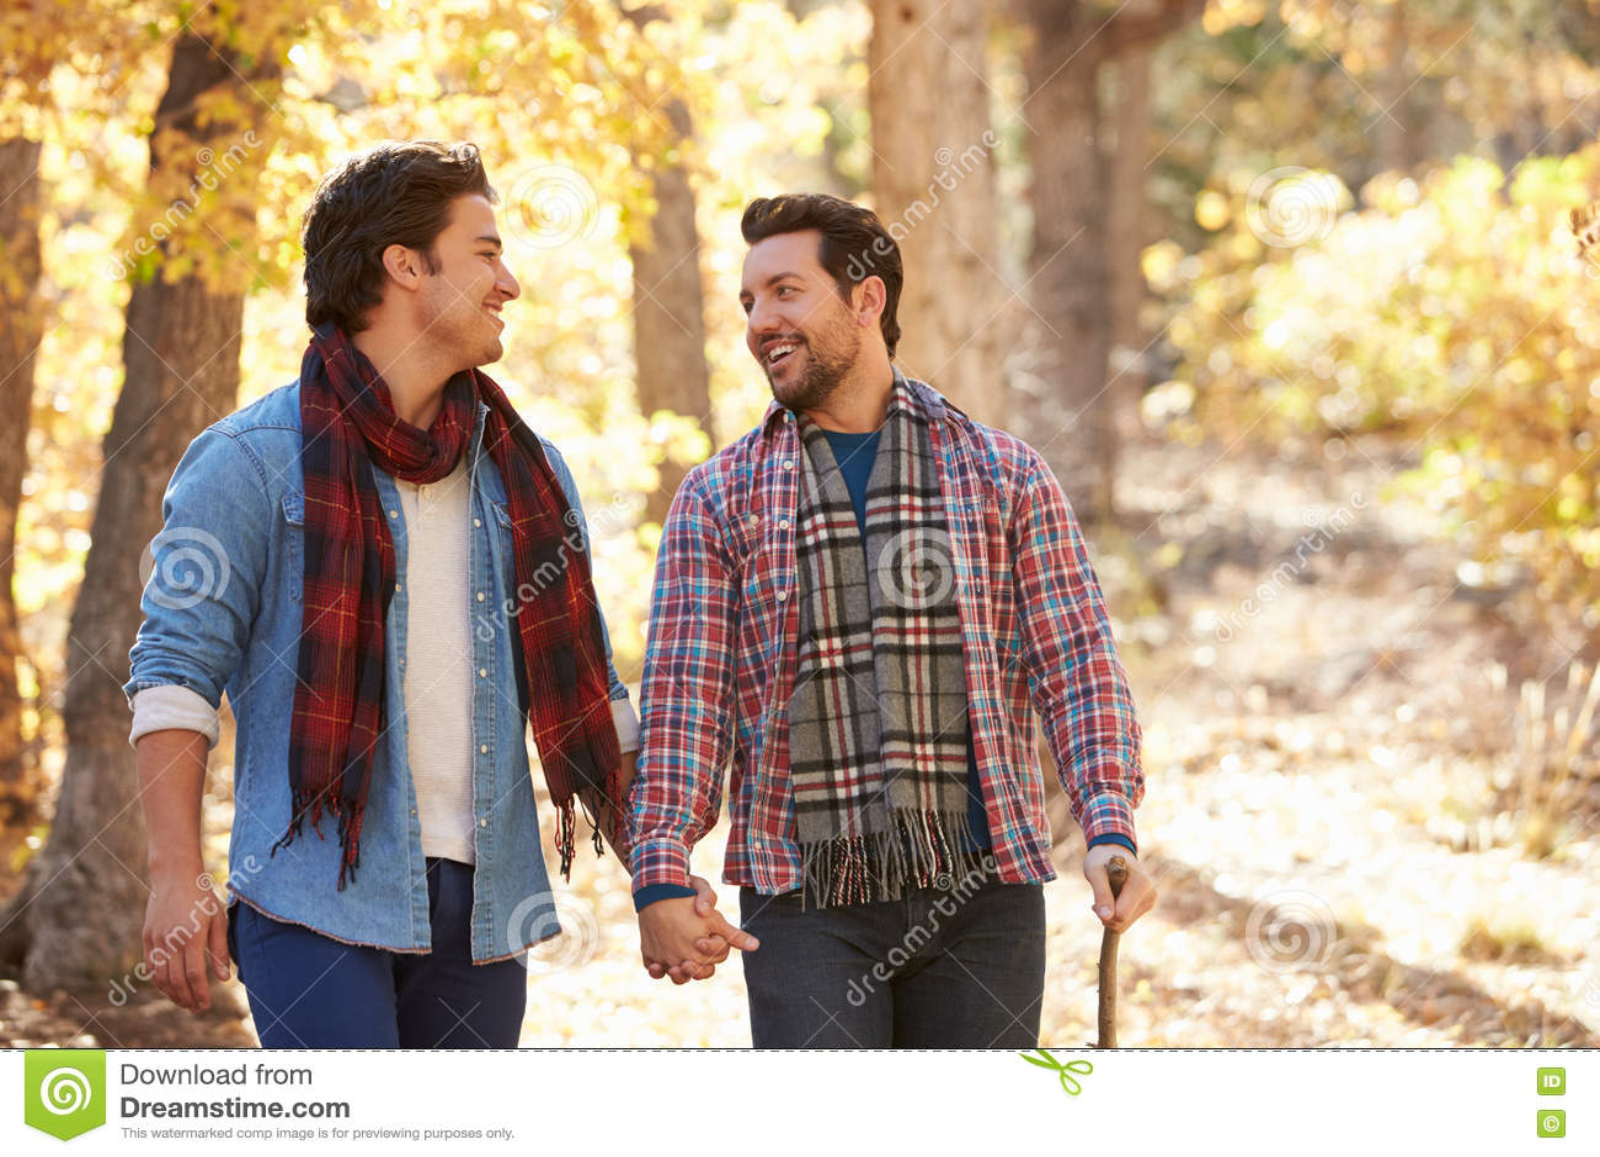 is hillary swank gay